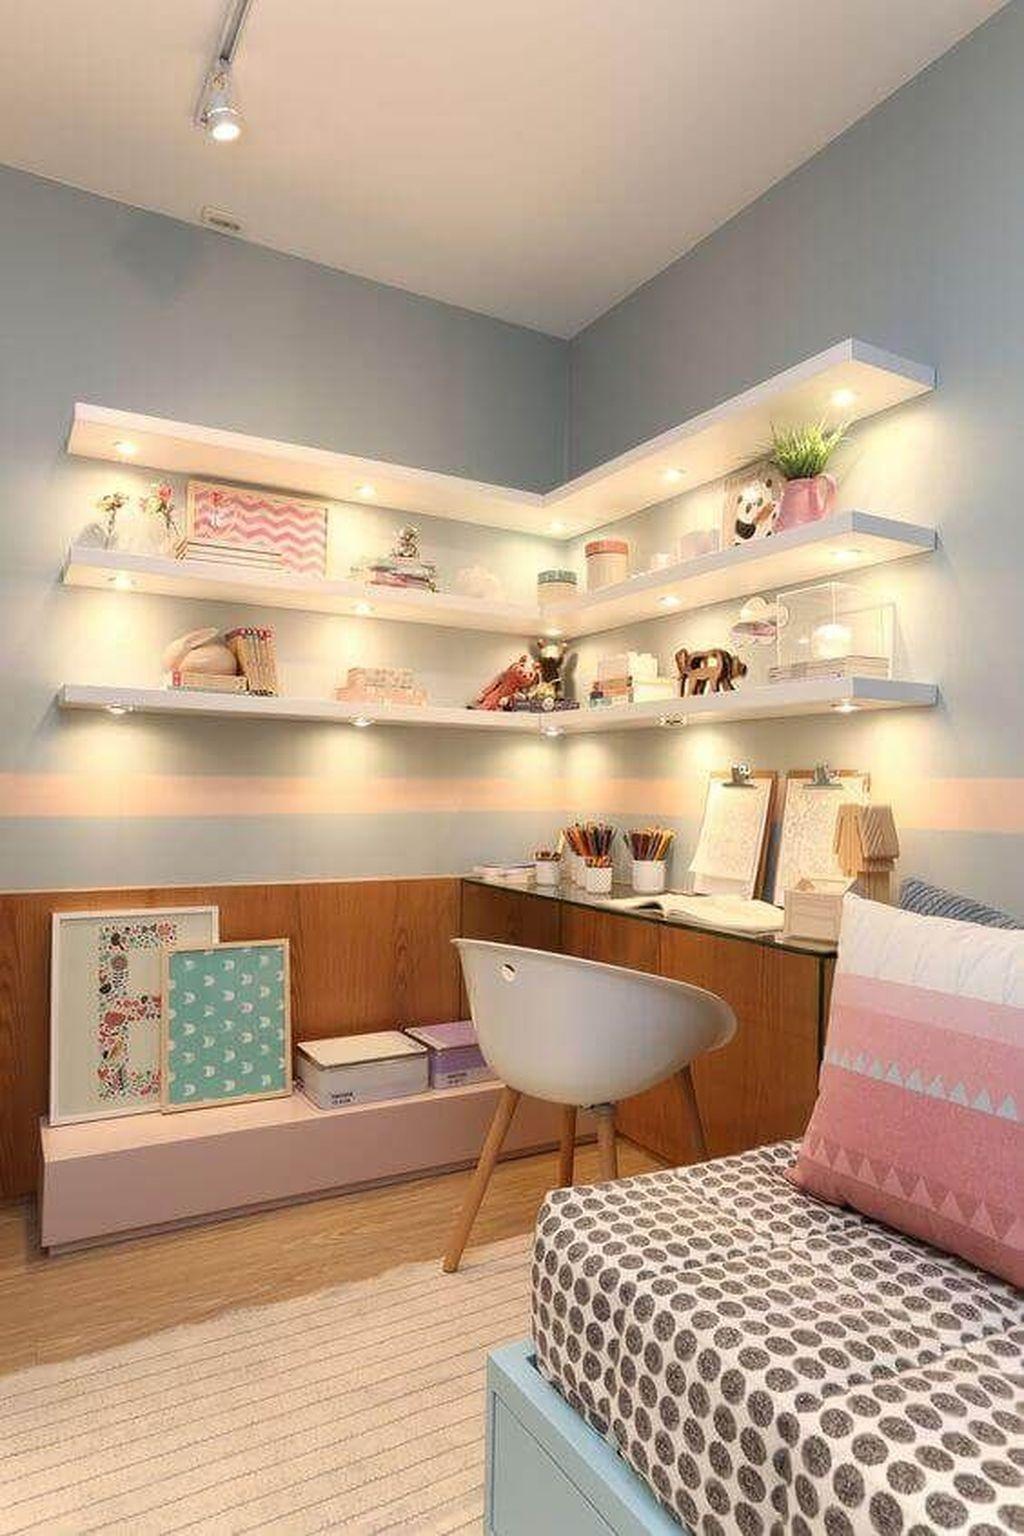 Cheap Diy Wall Shelves Floating Ideas 50 Girl Bedroom Designs